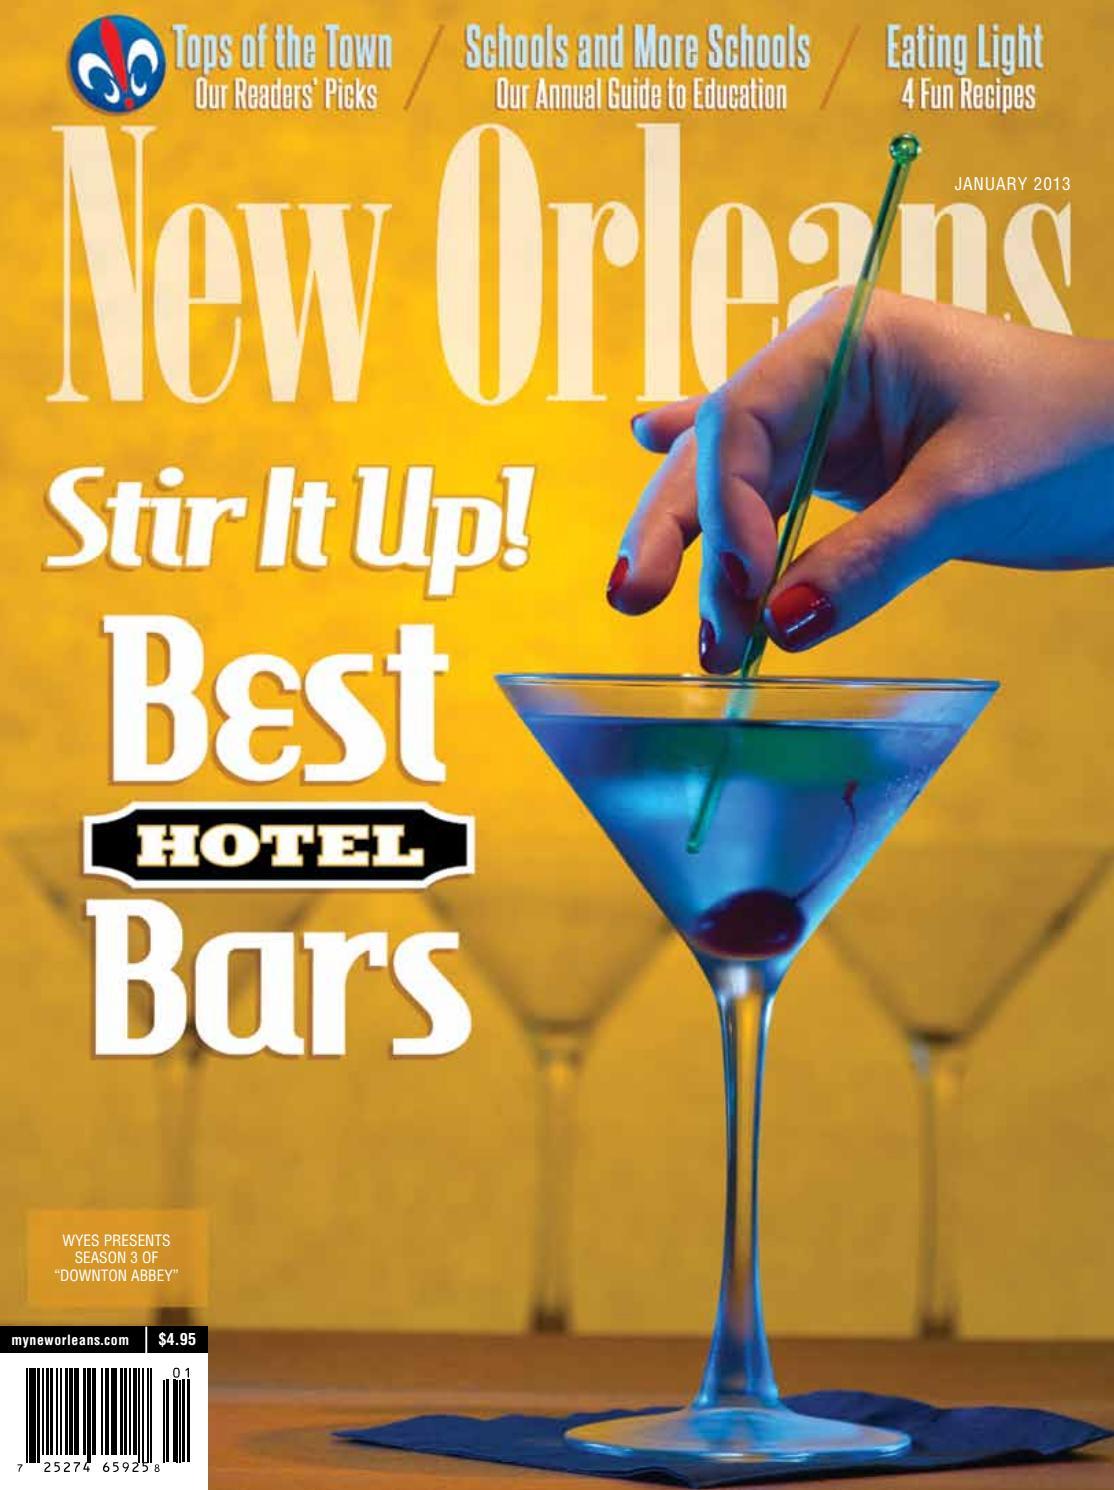 New Orleans Magazine January 2013